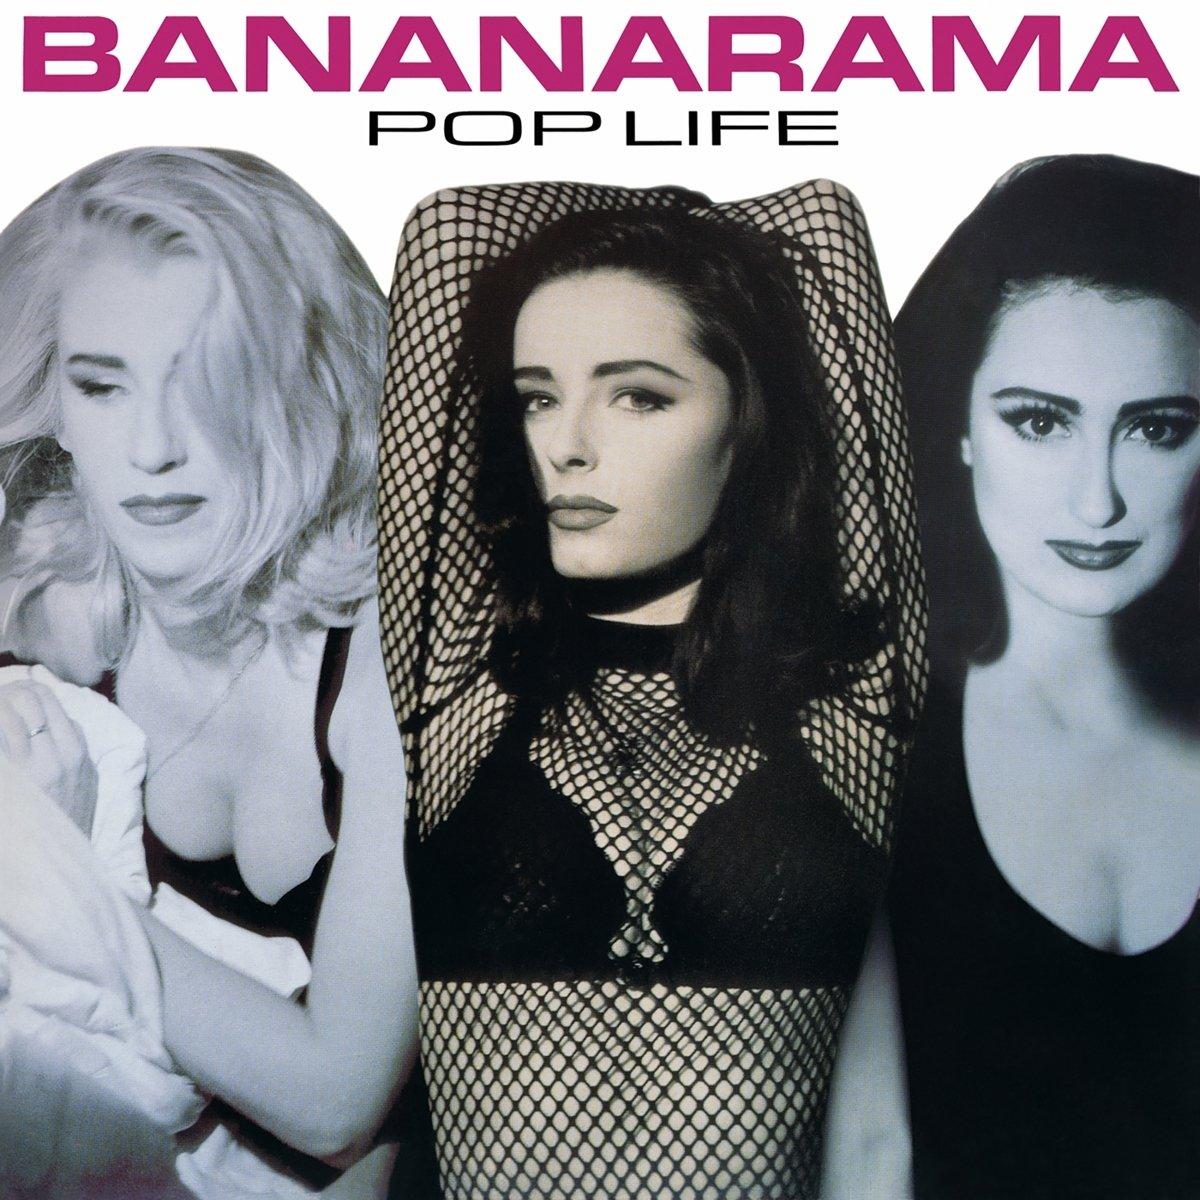 CD : Bananarama - Pop Life (Collector's Edition, United Kingdom - Import)